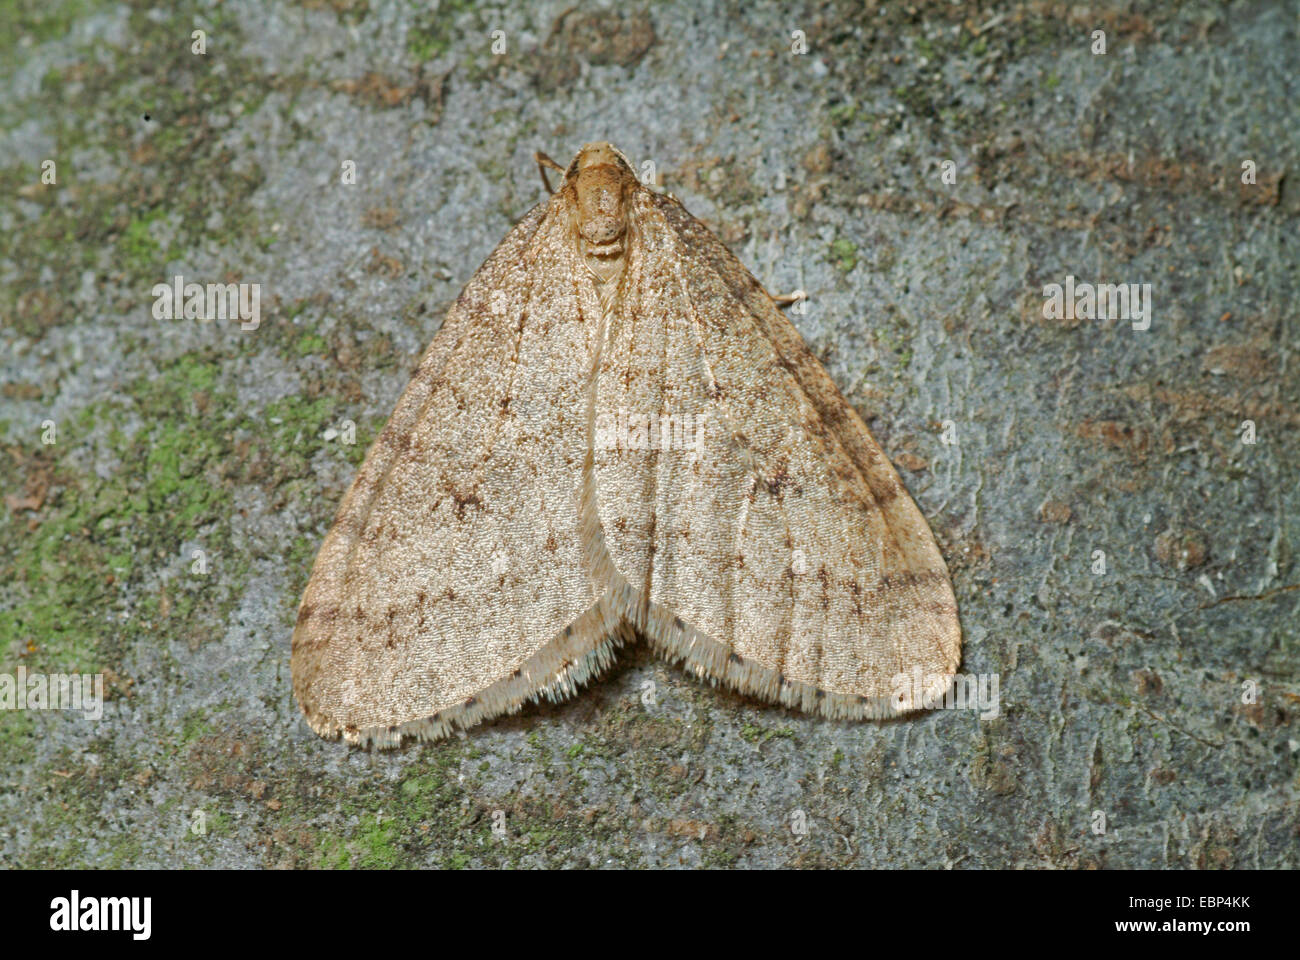 winter moth, small winter moth (Operophtera brumata, Cheimatobia brumata), on bark, Germany - Stock Image